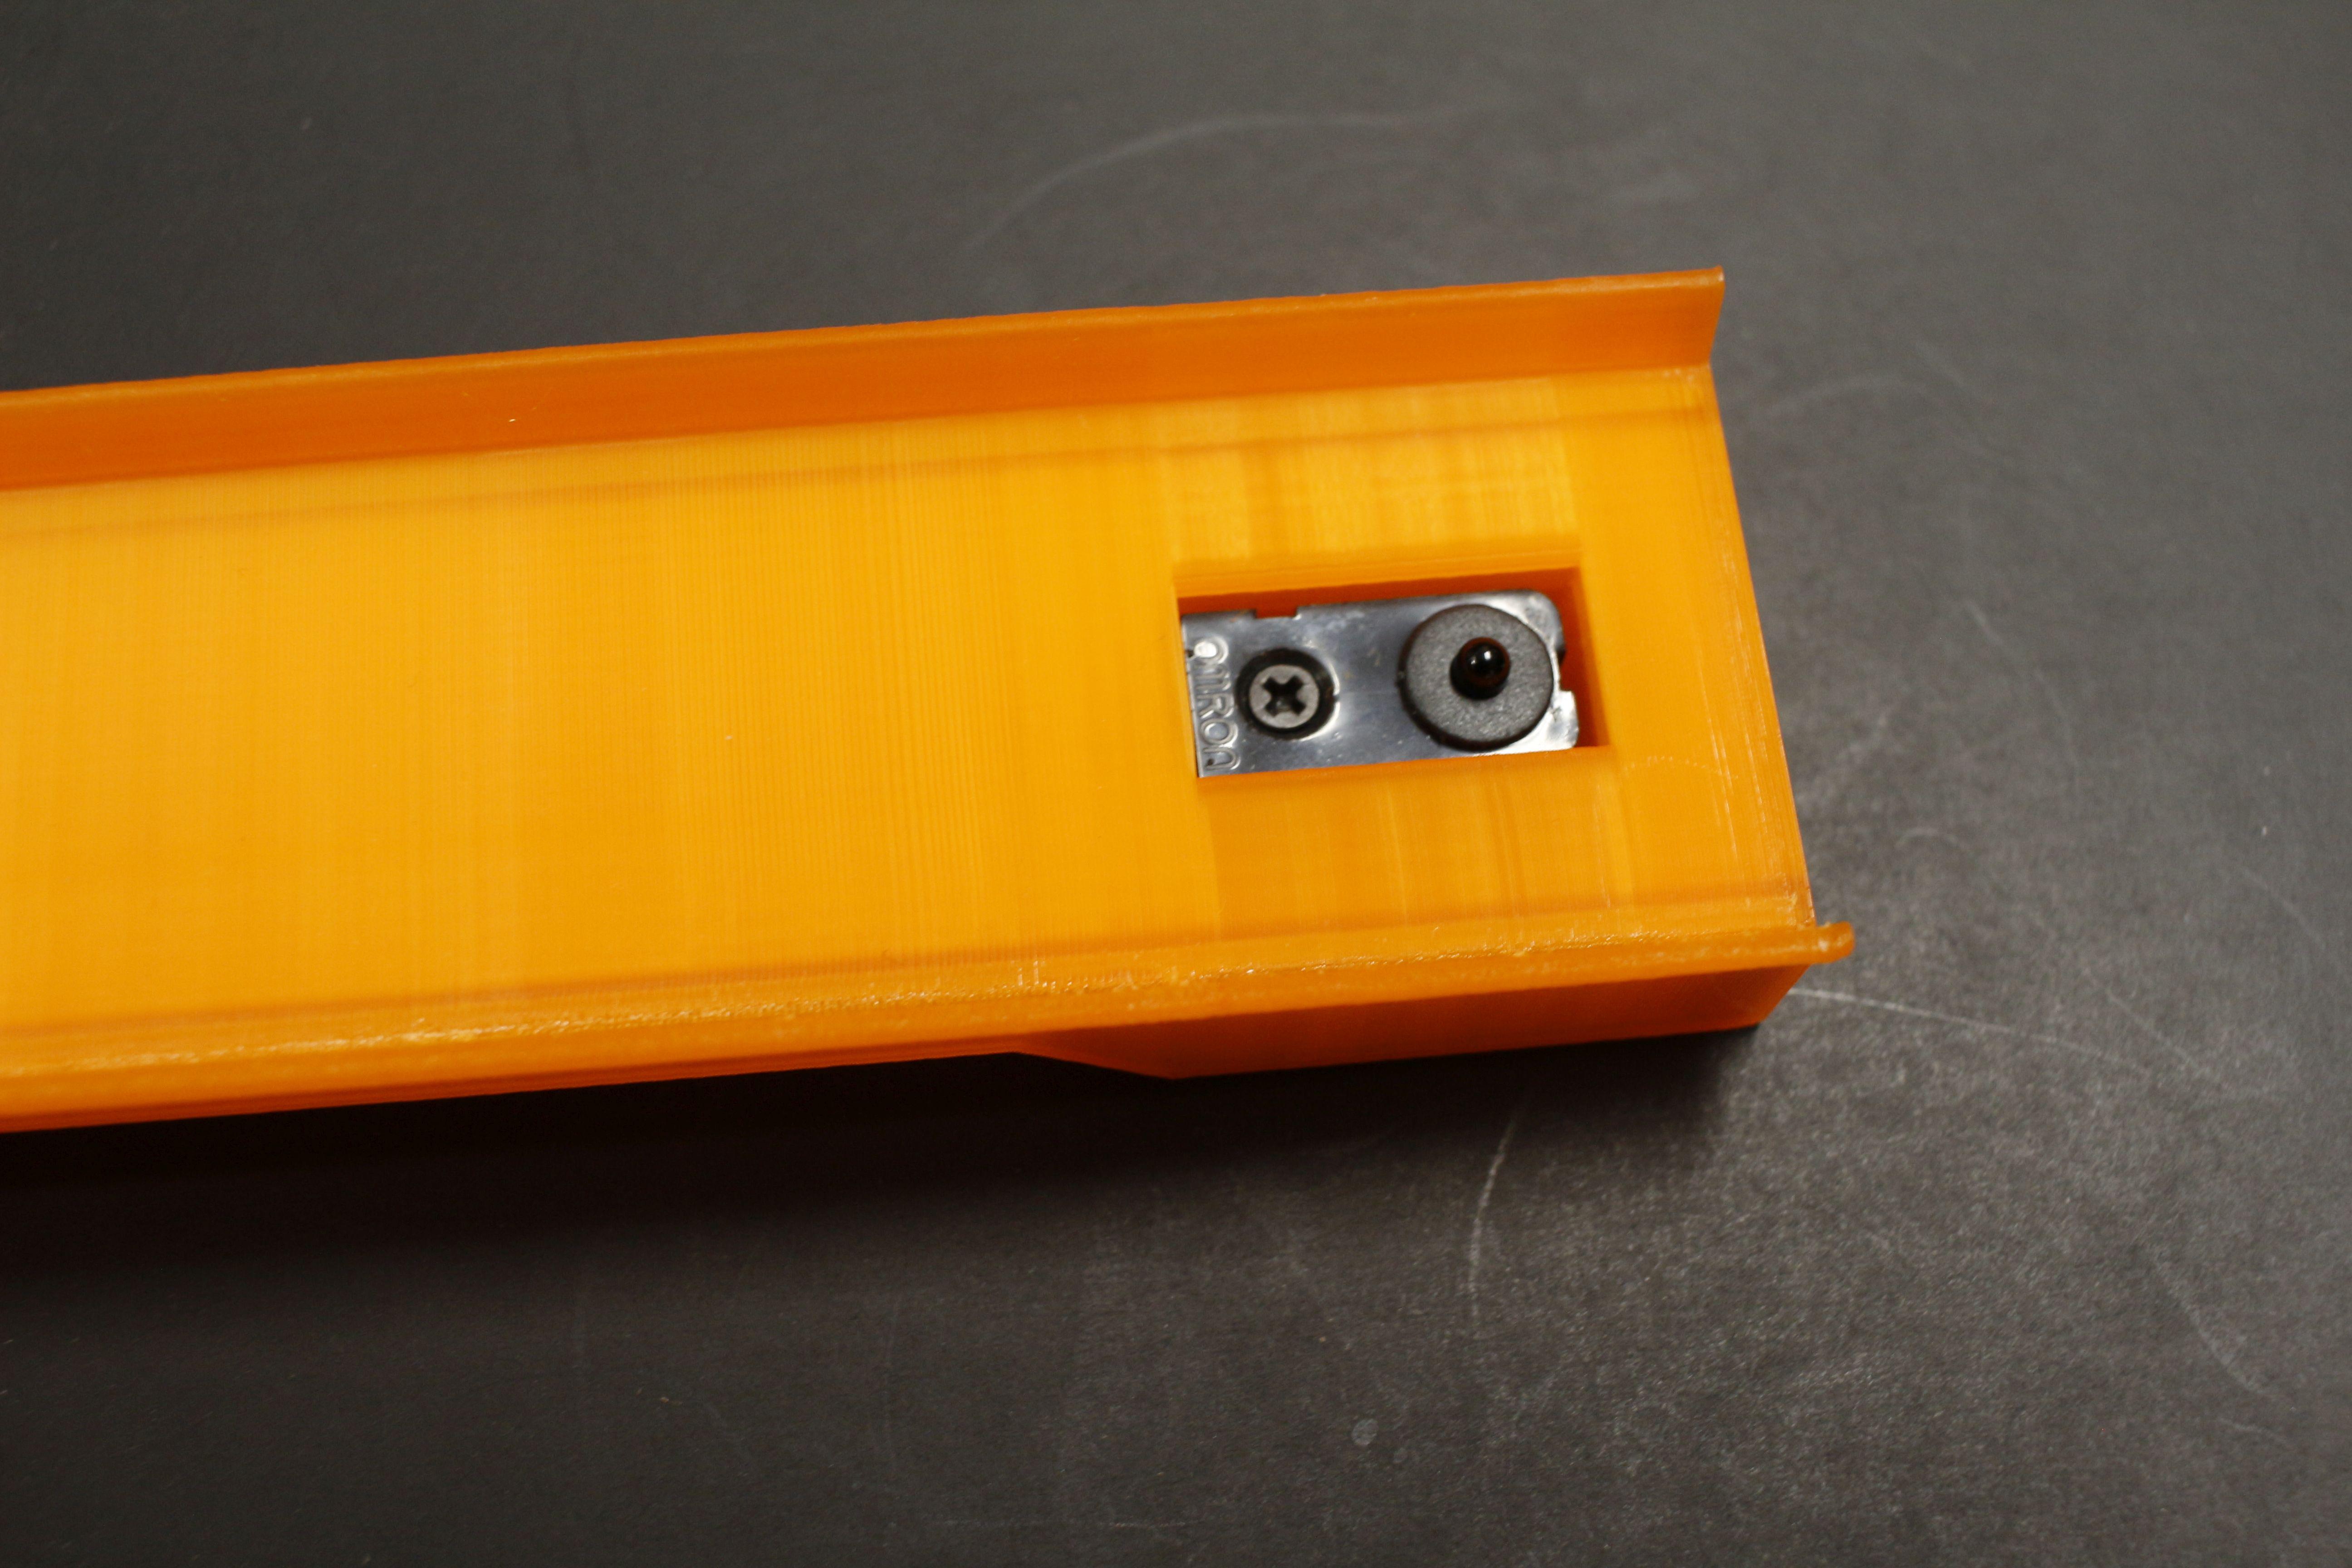 sensors__MG_9659.jpg